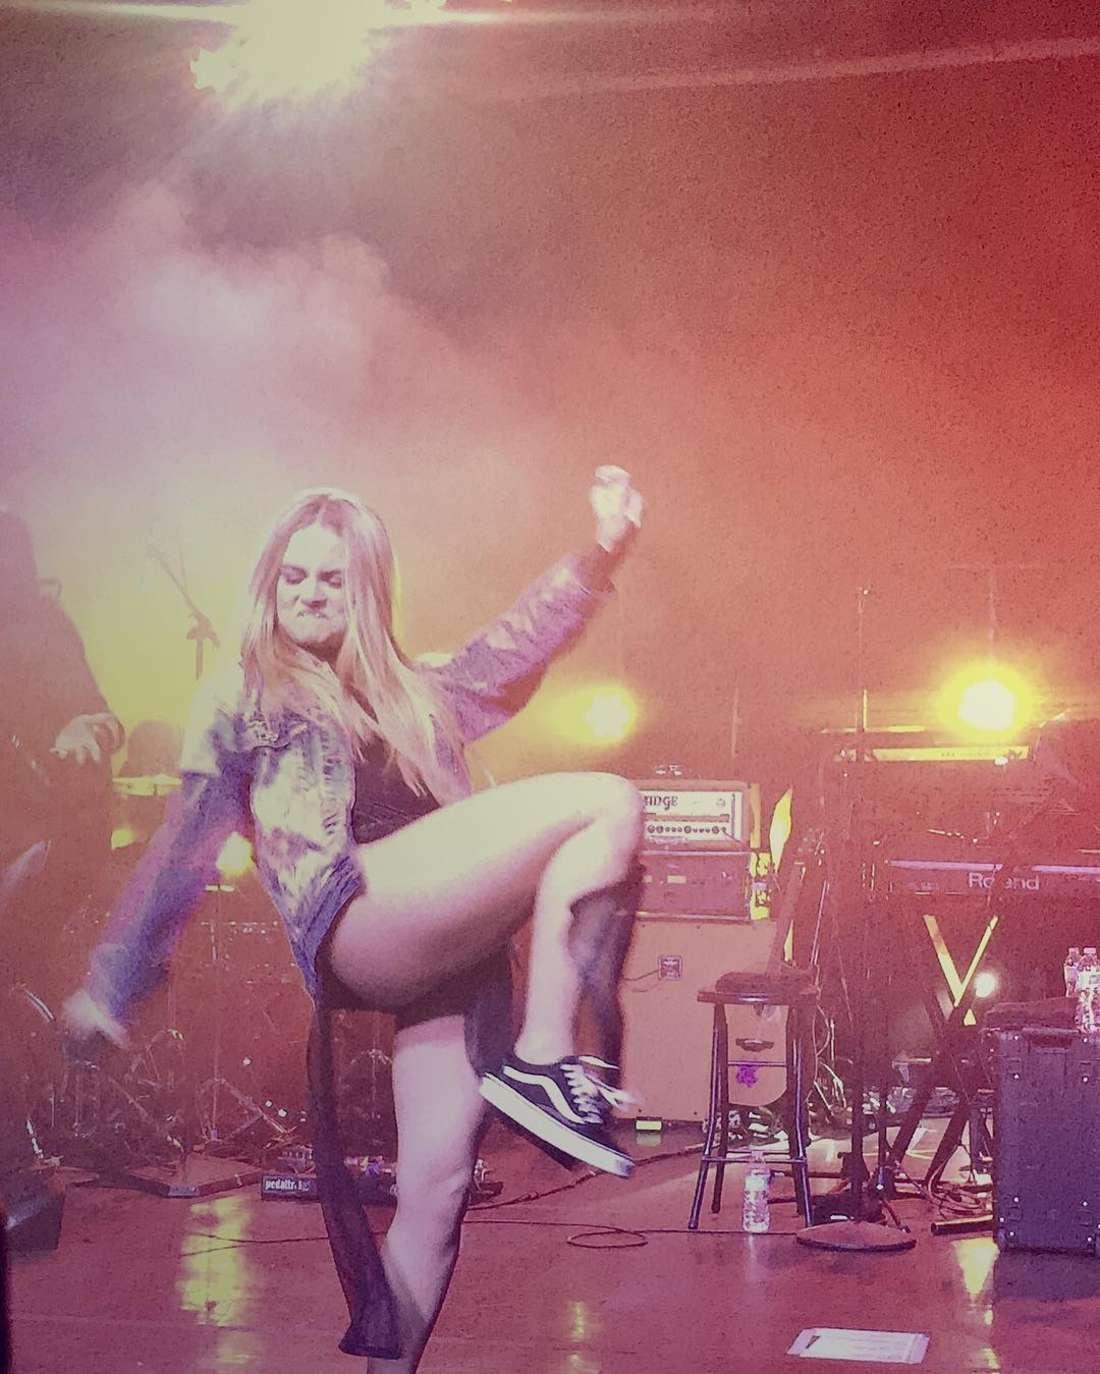 Joanna Jojo Levesque Performs at Mad Love Tour in Santa Ana